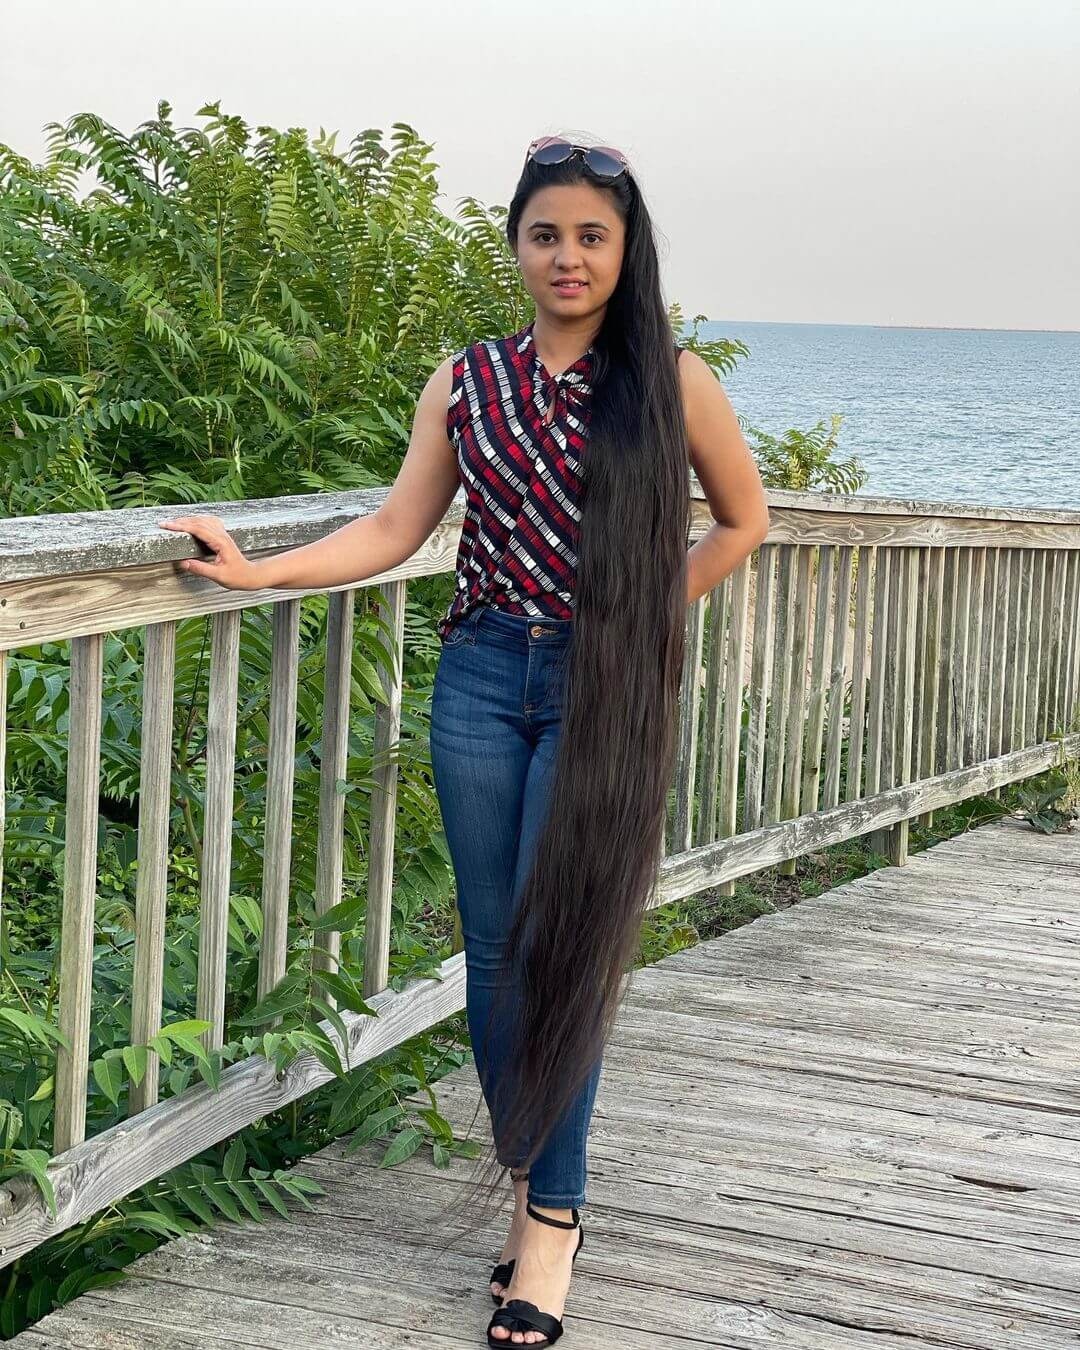 Zahab Khan showing off her incredible hair length